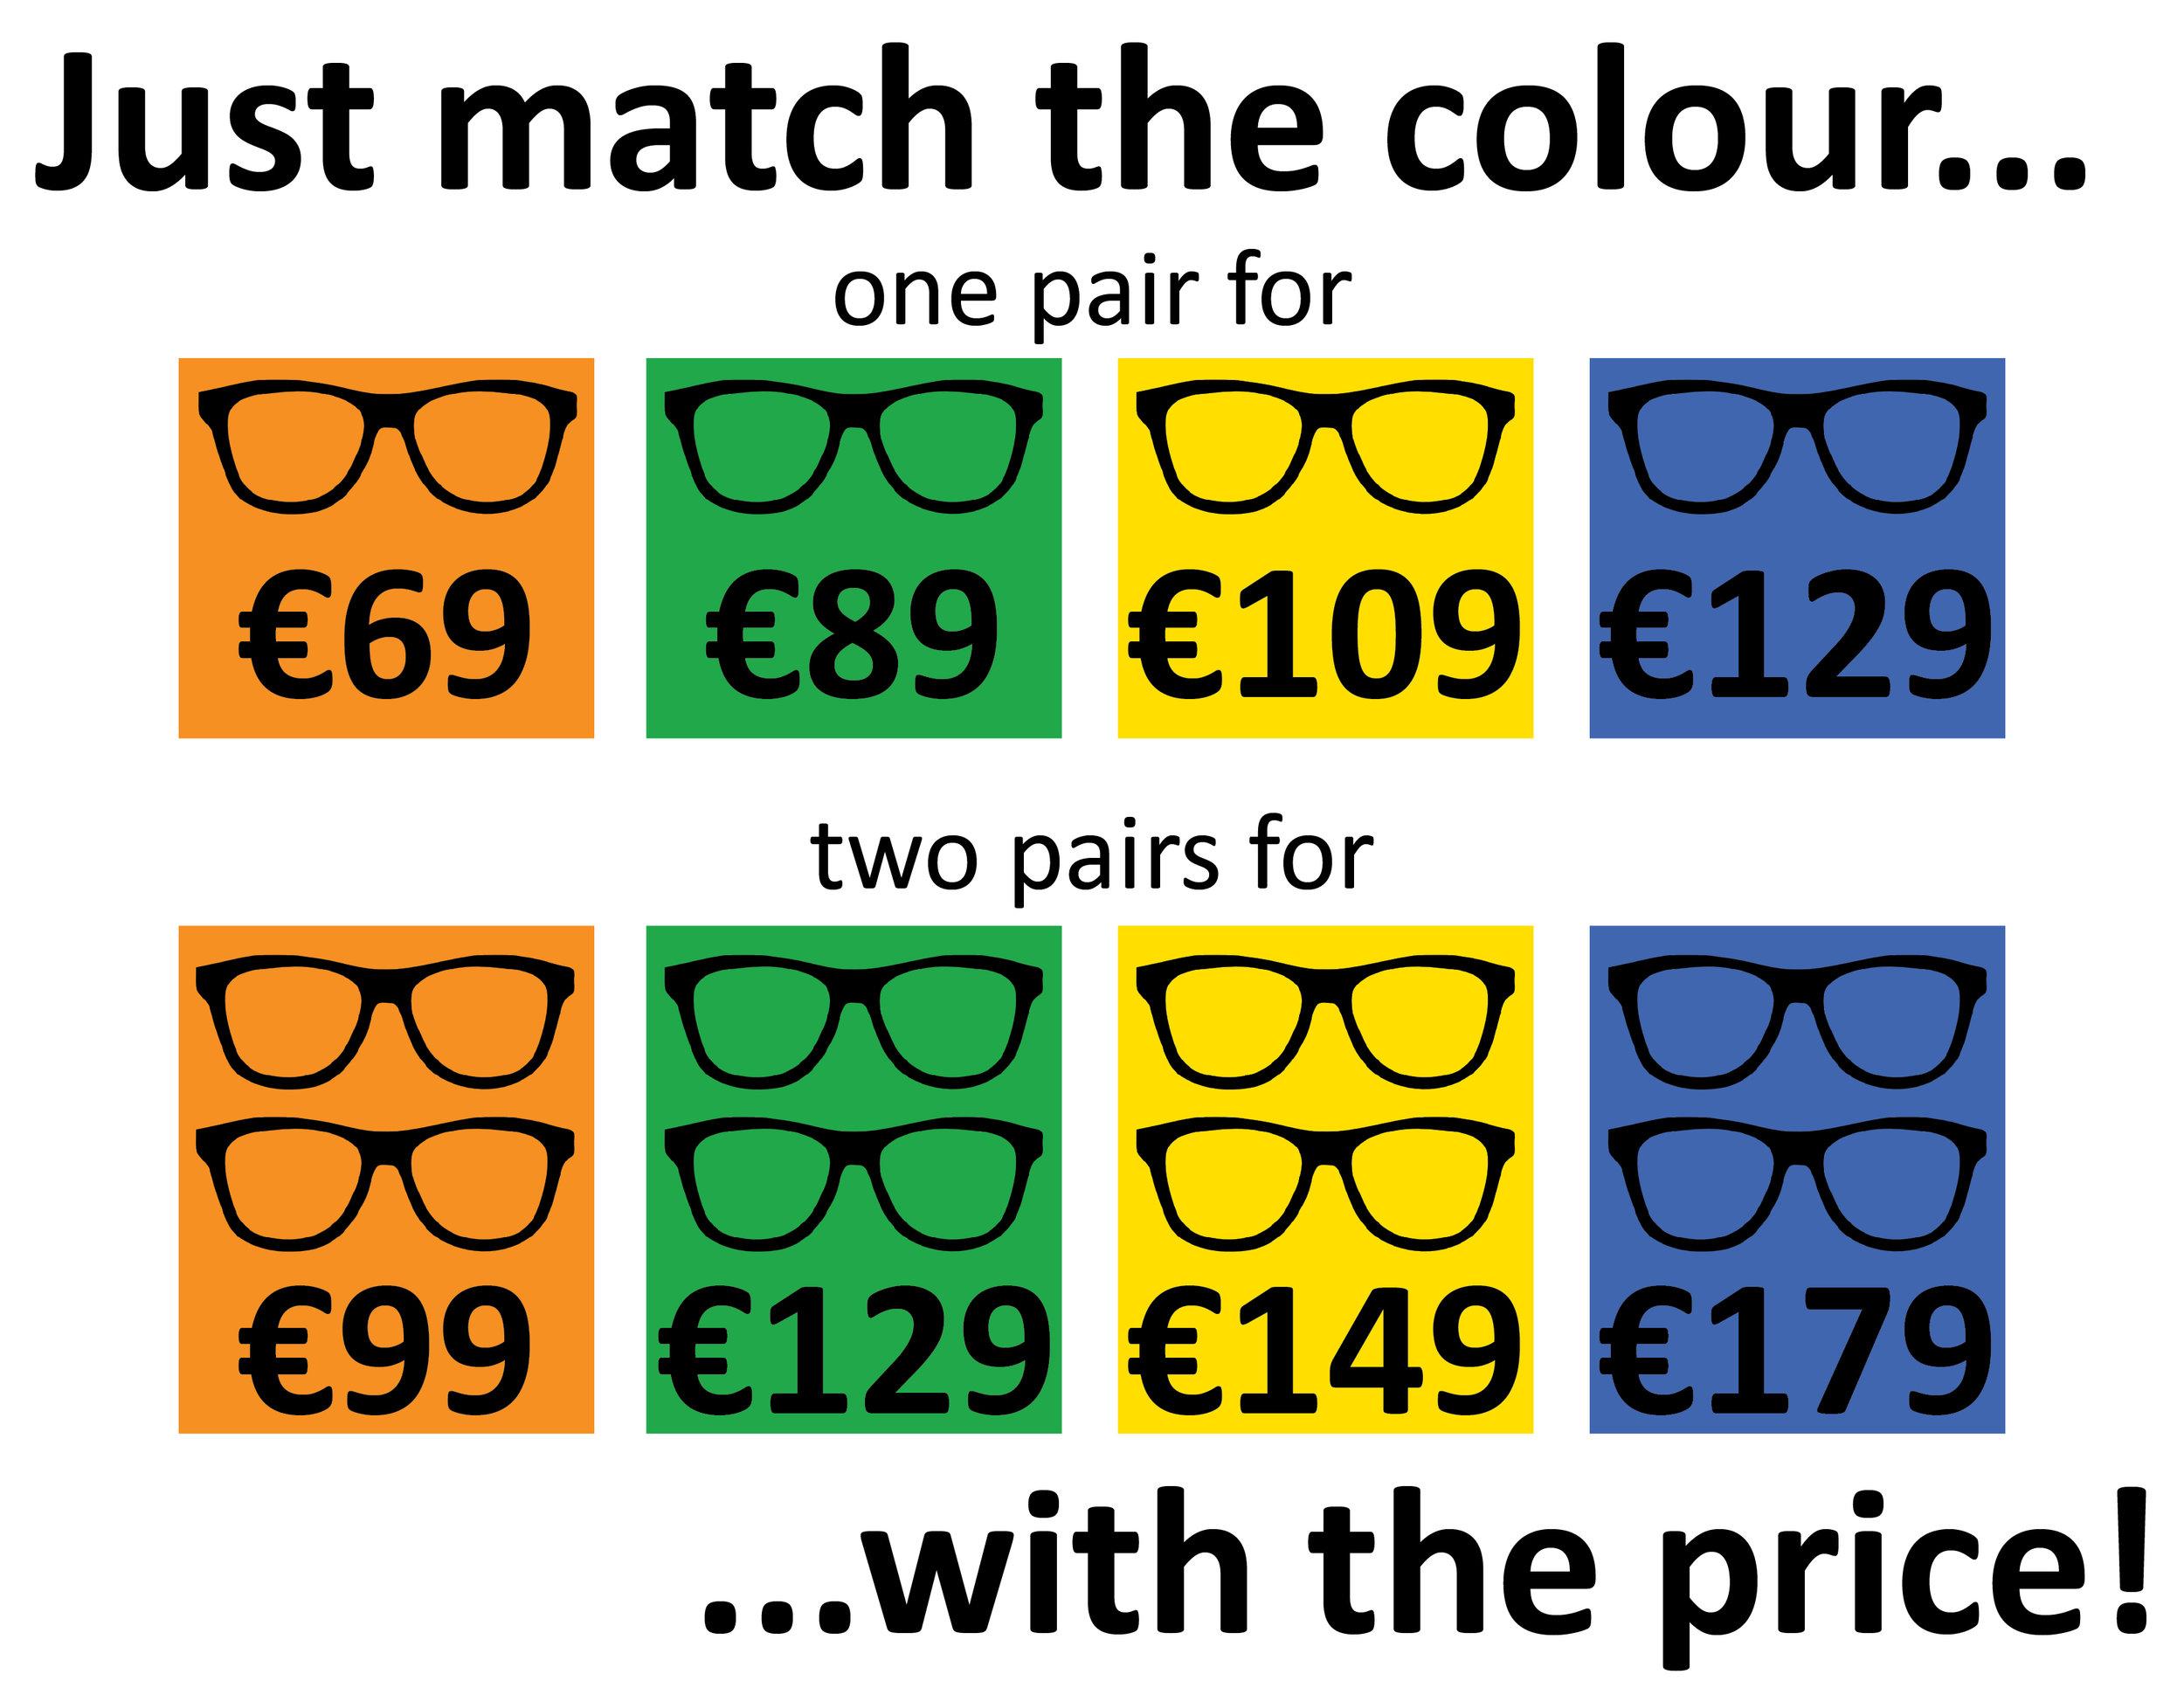 match the colour.jpg